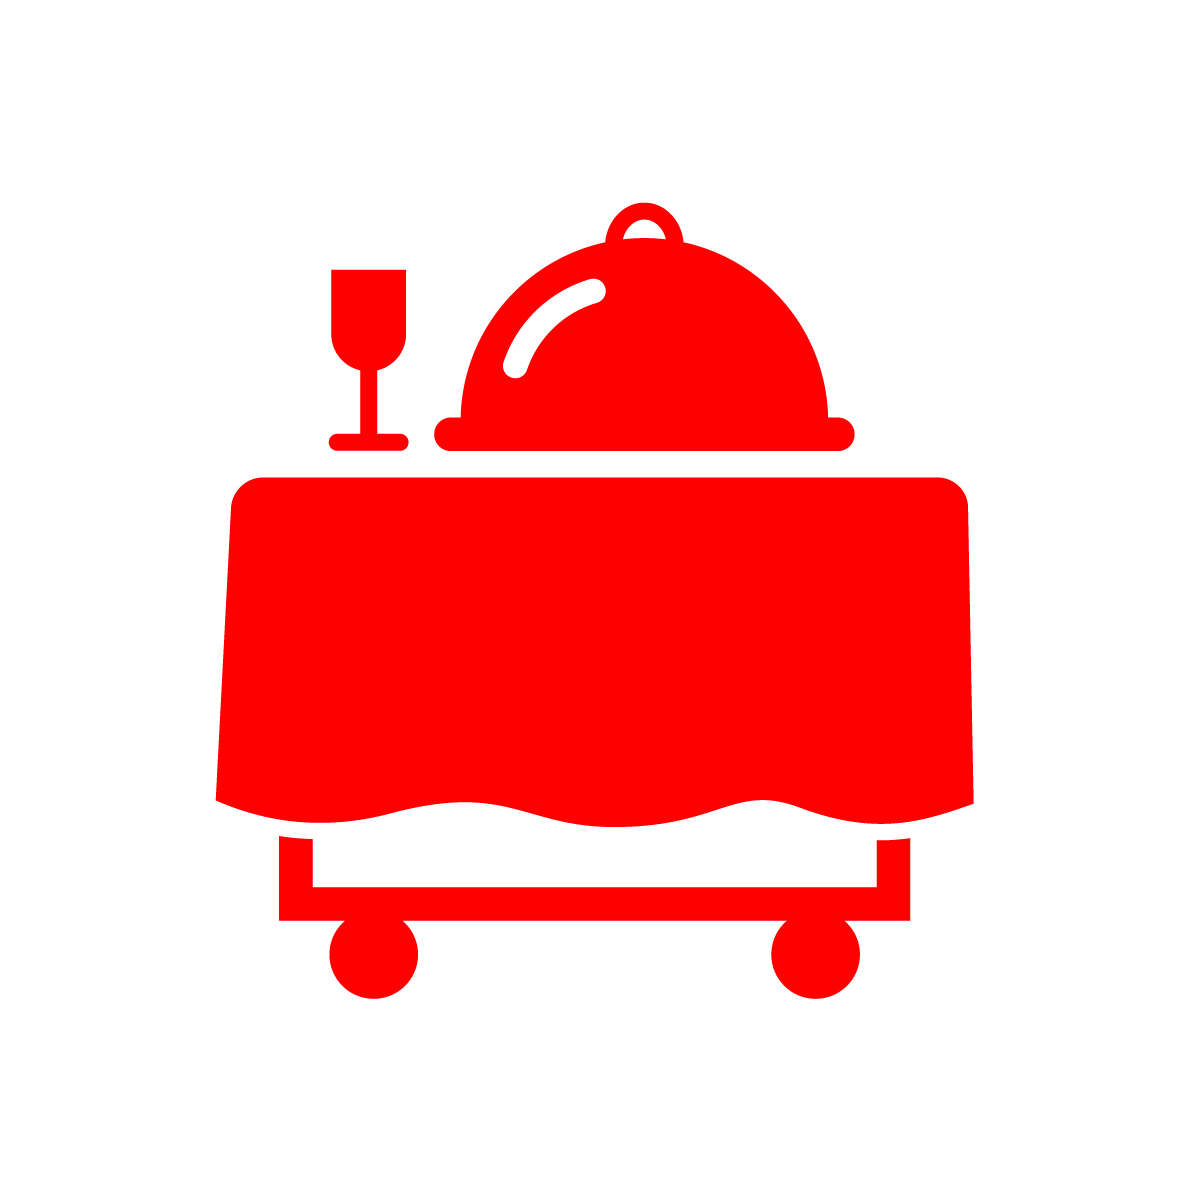 Oracle help center documentation. Restaurants clipart hospitality service